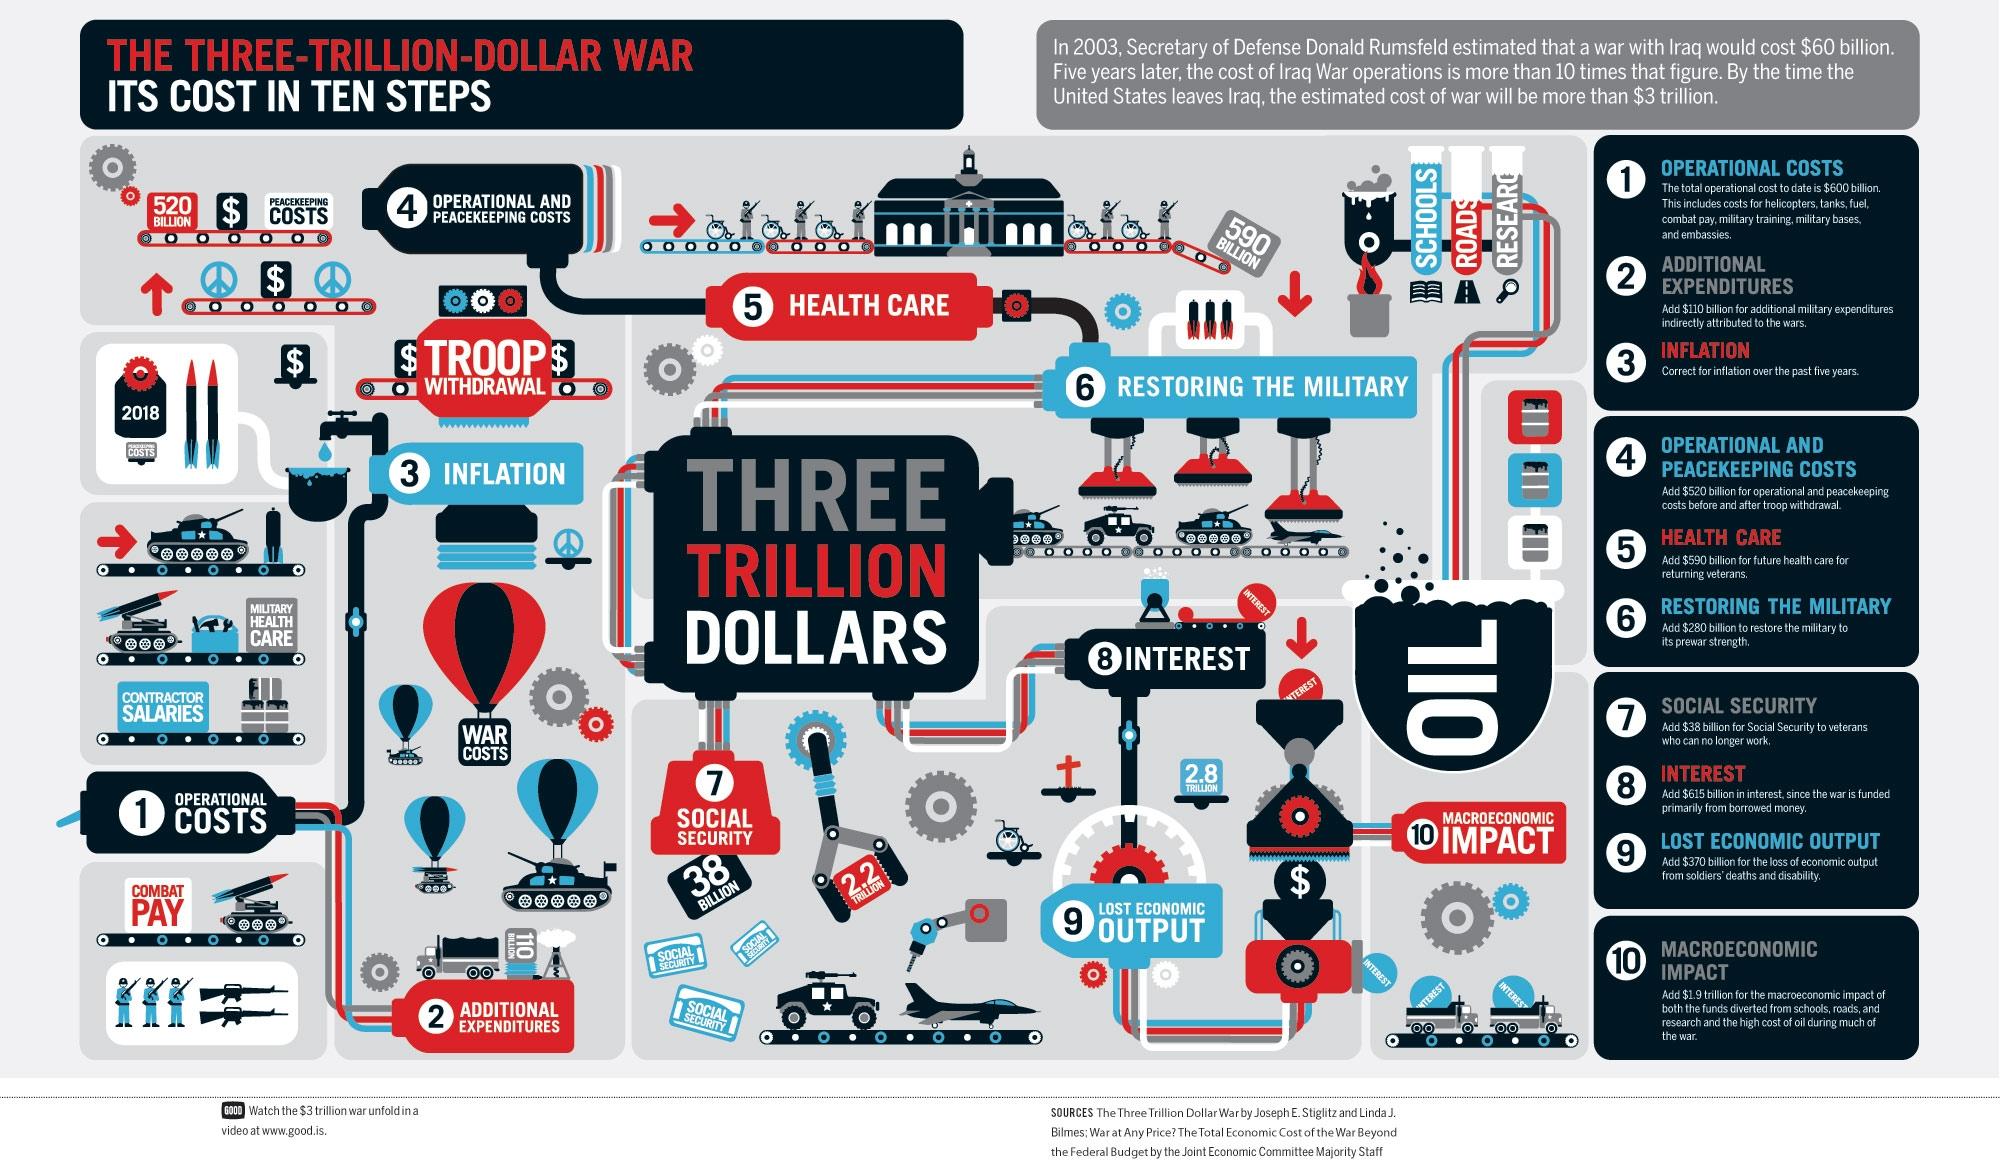 three trillion dollar war  אינפוגרפיקה ברשת – כמה באמת שווה תמונה?